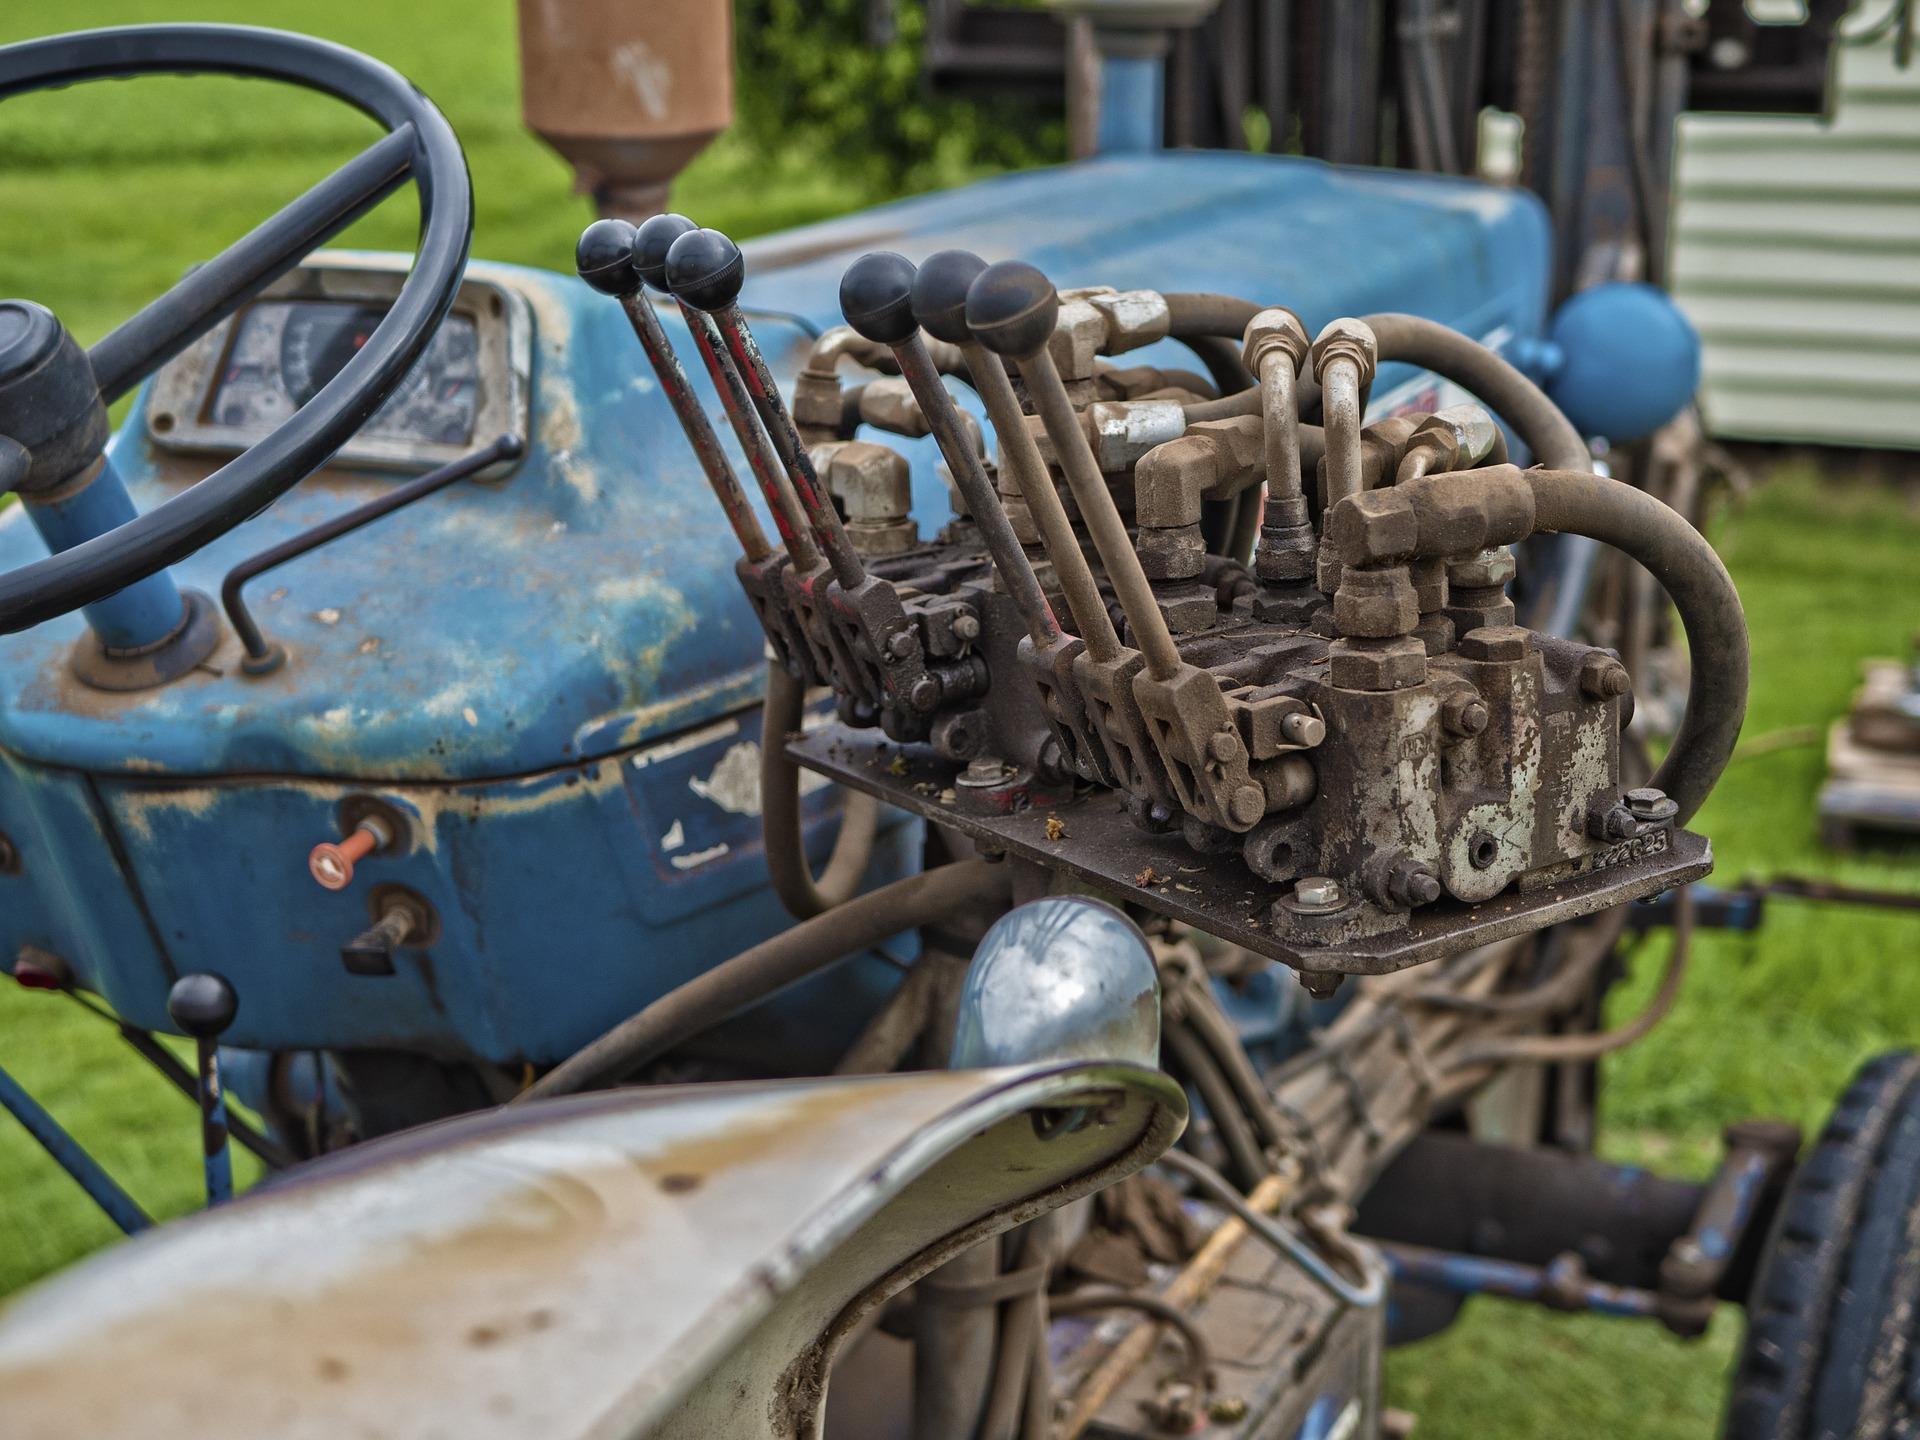 tractor-1184138_1920.jpg